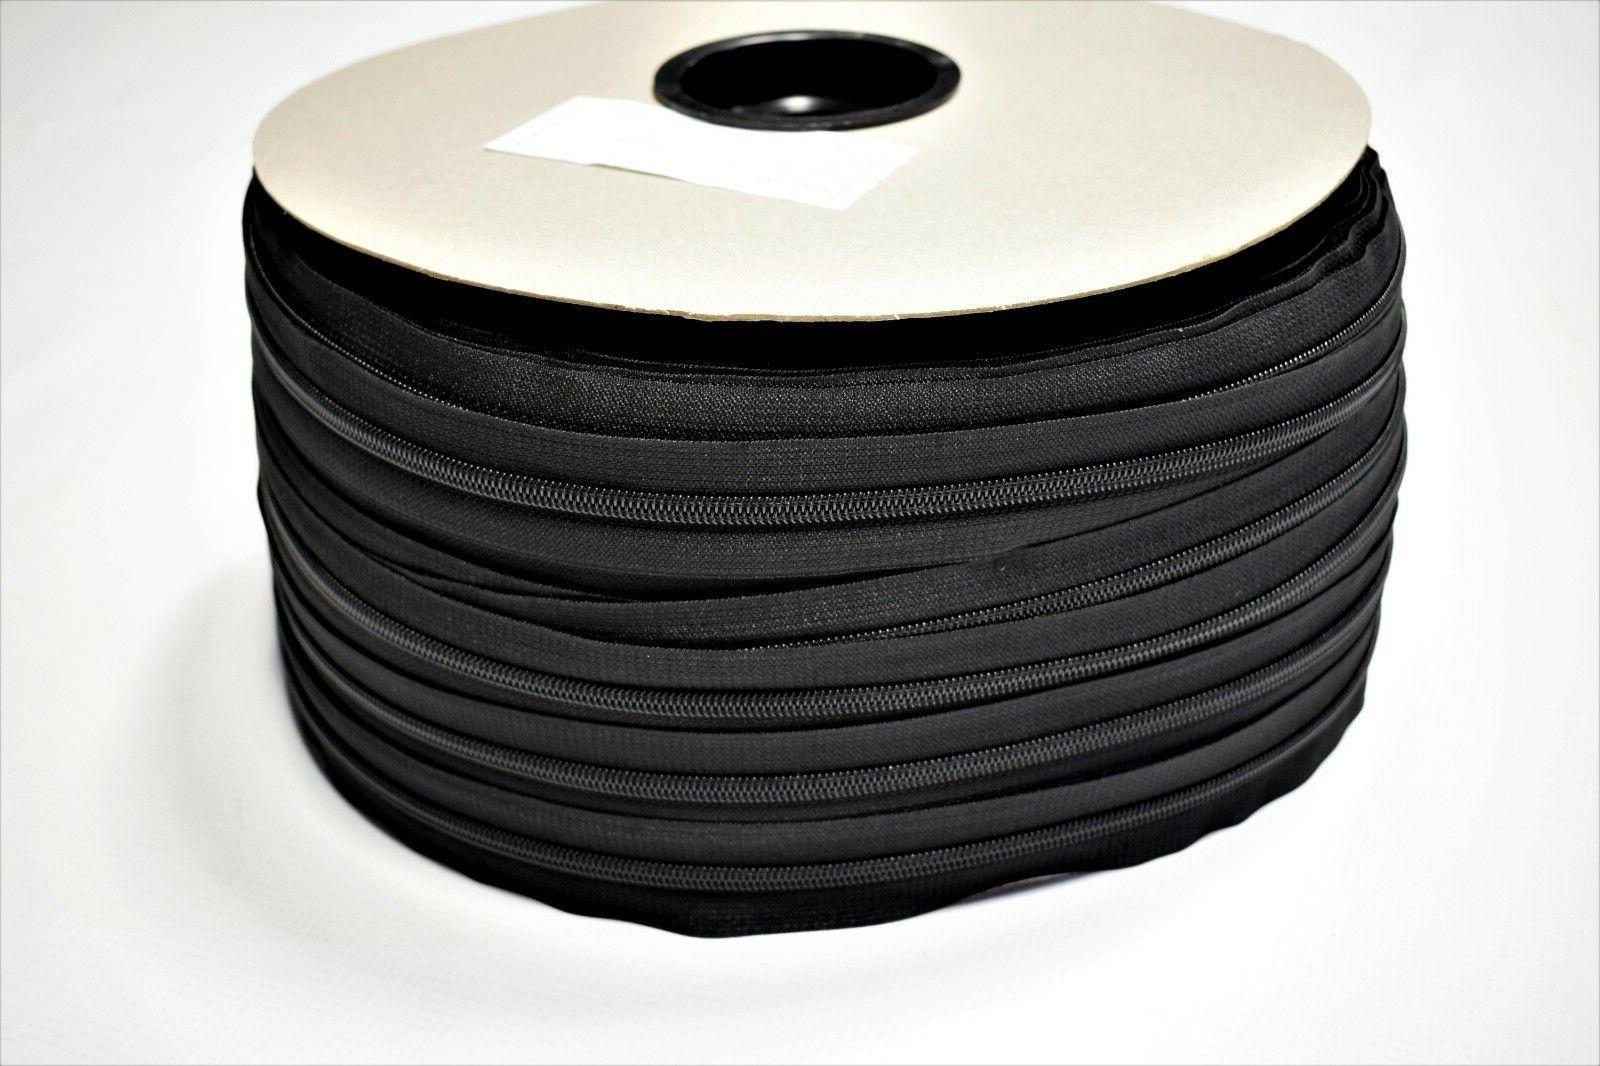 #5 Black Zipper Chain Cloth Apparel Jackets Heavy Duty